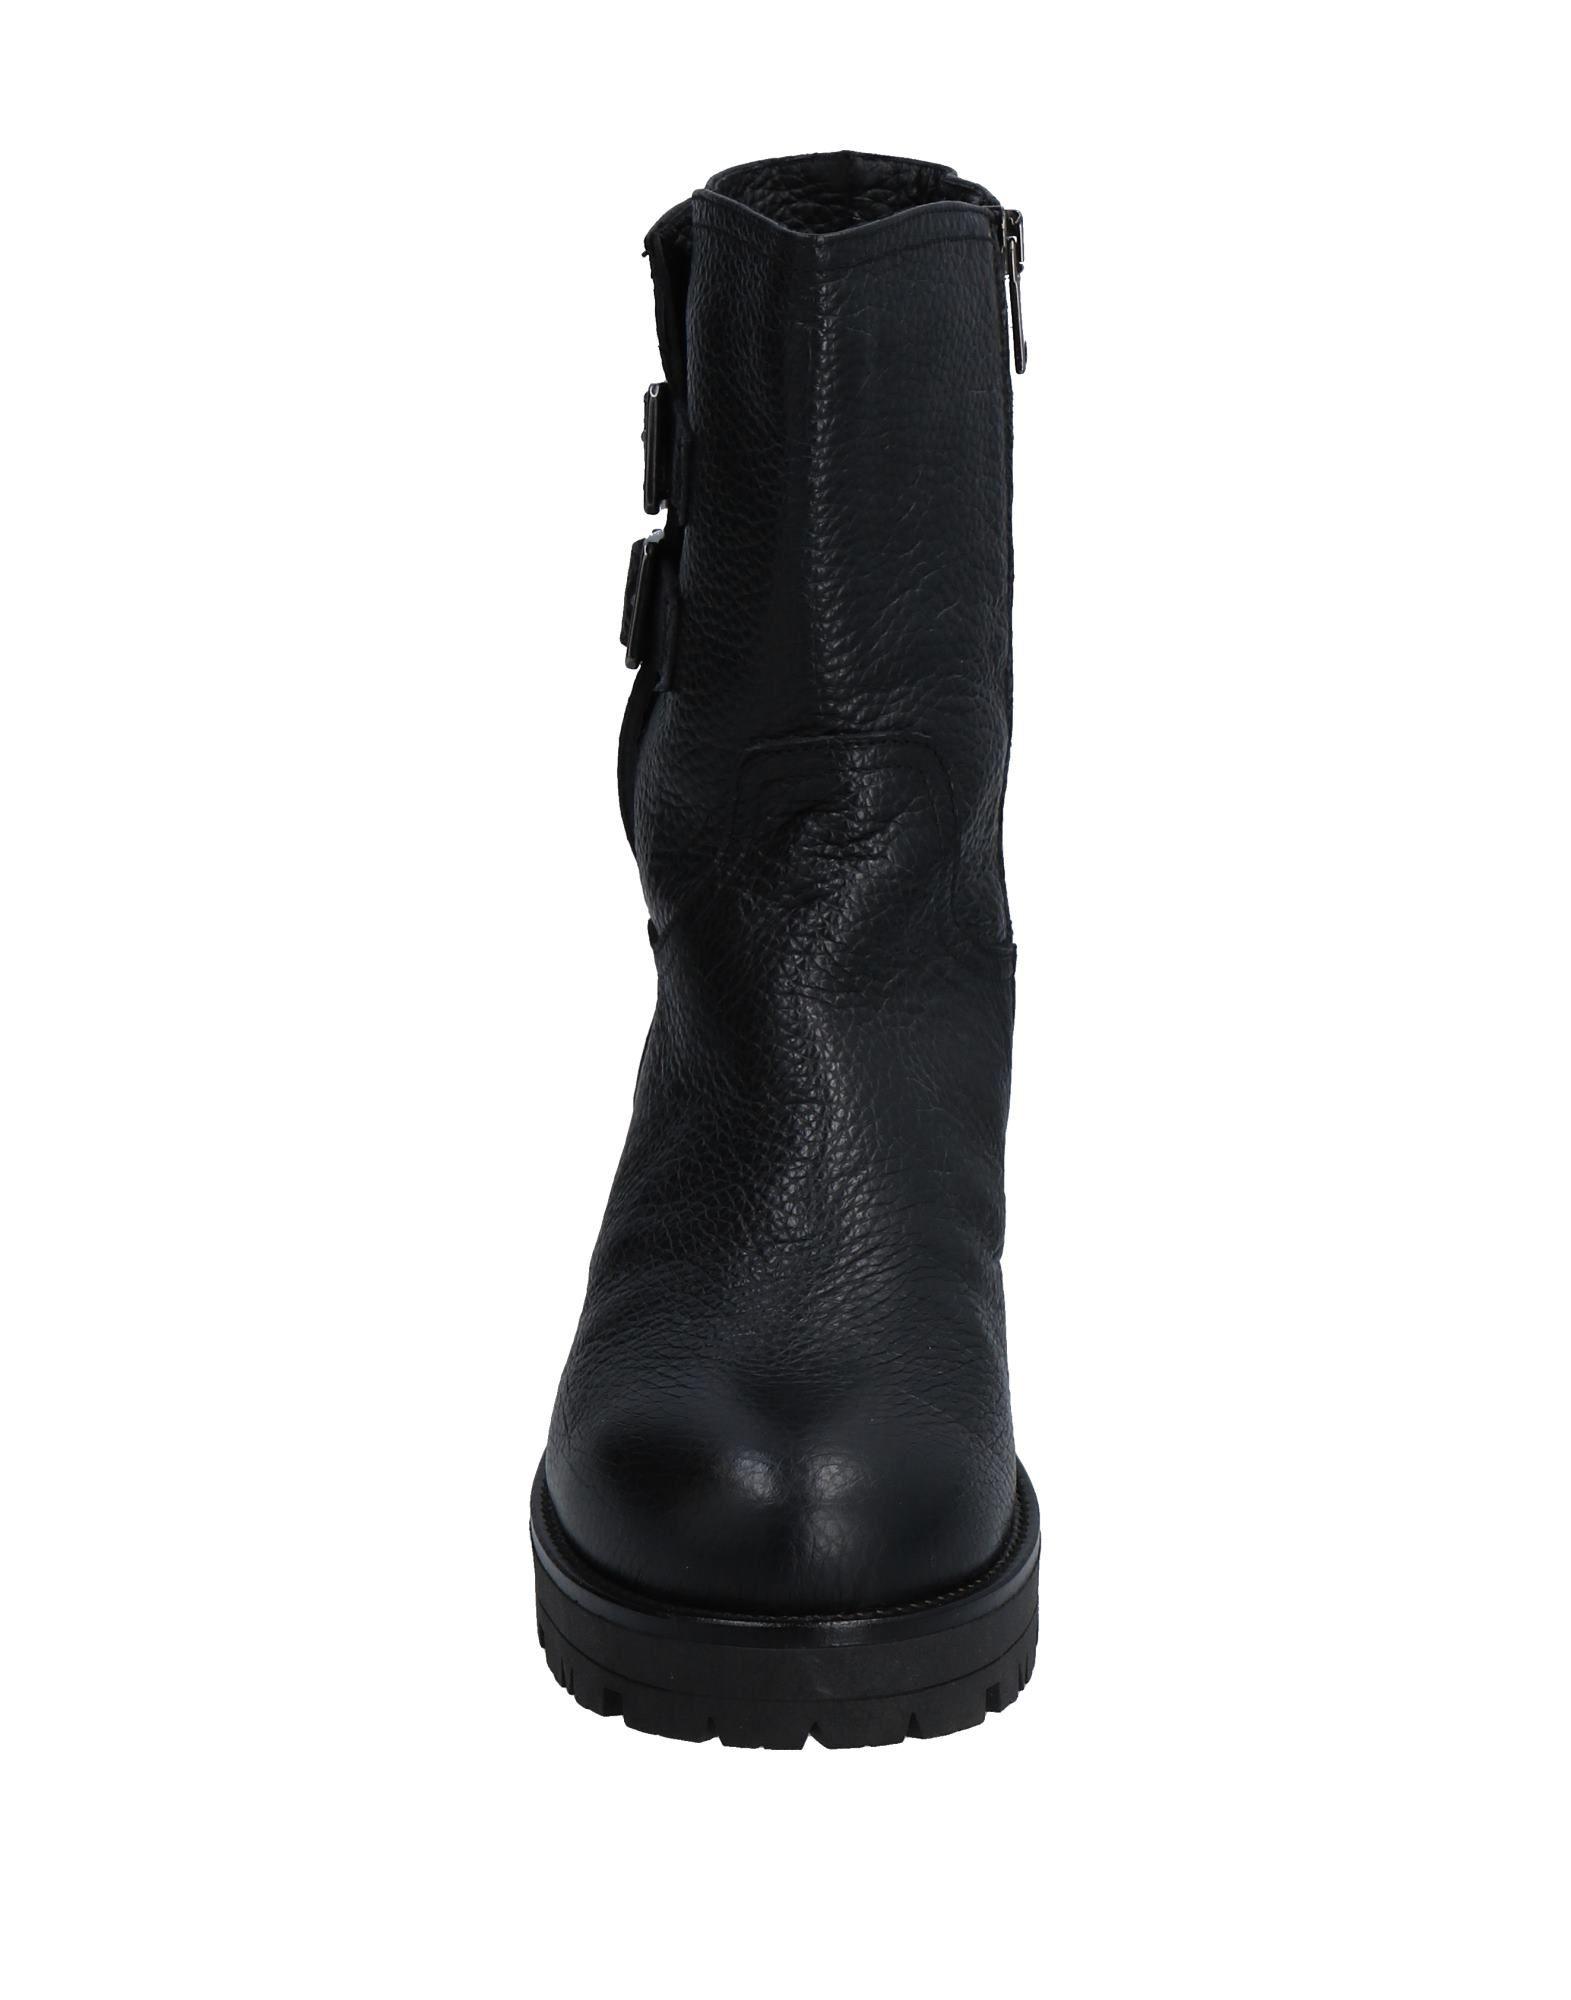 Fratelli Karida Stiefelette Damen Neue  11532545QW Neue Damen Schuhe e3542a